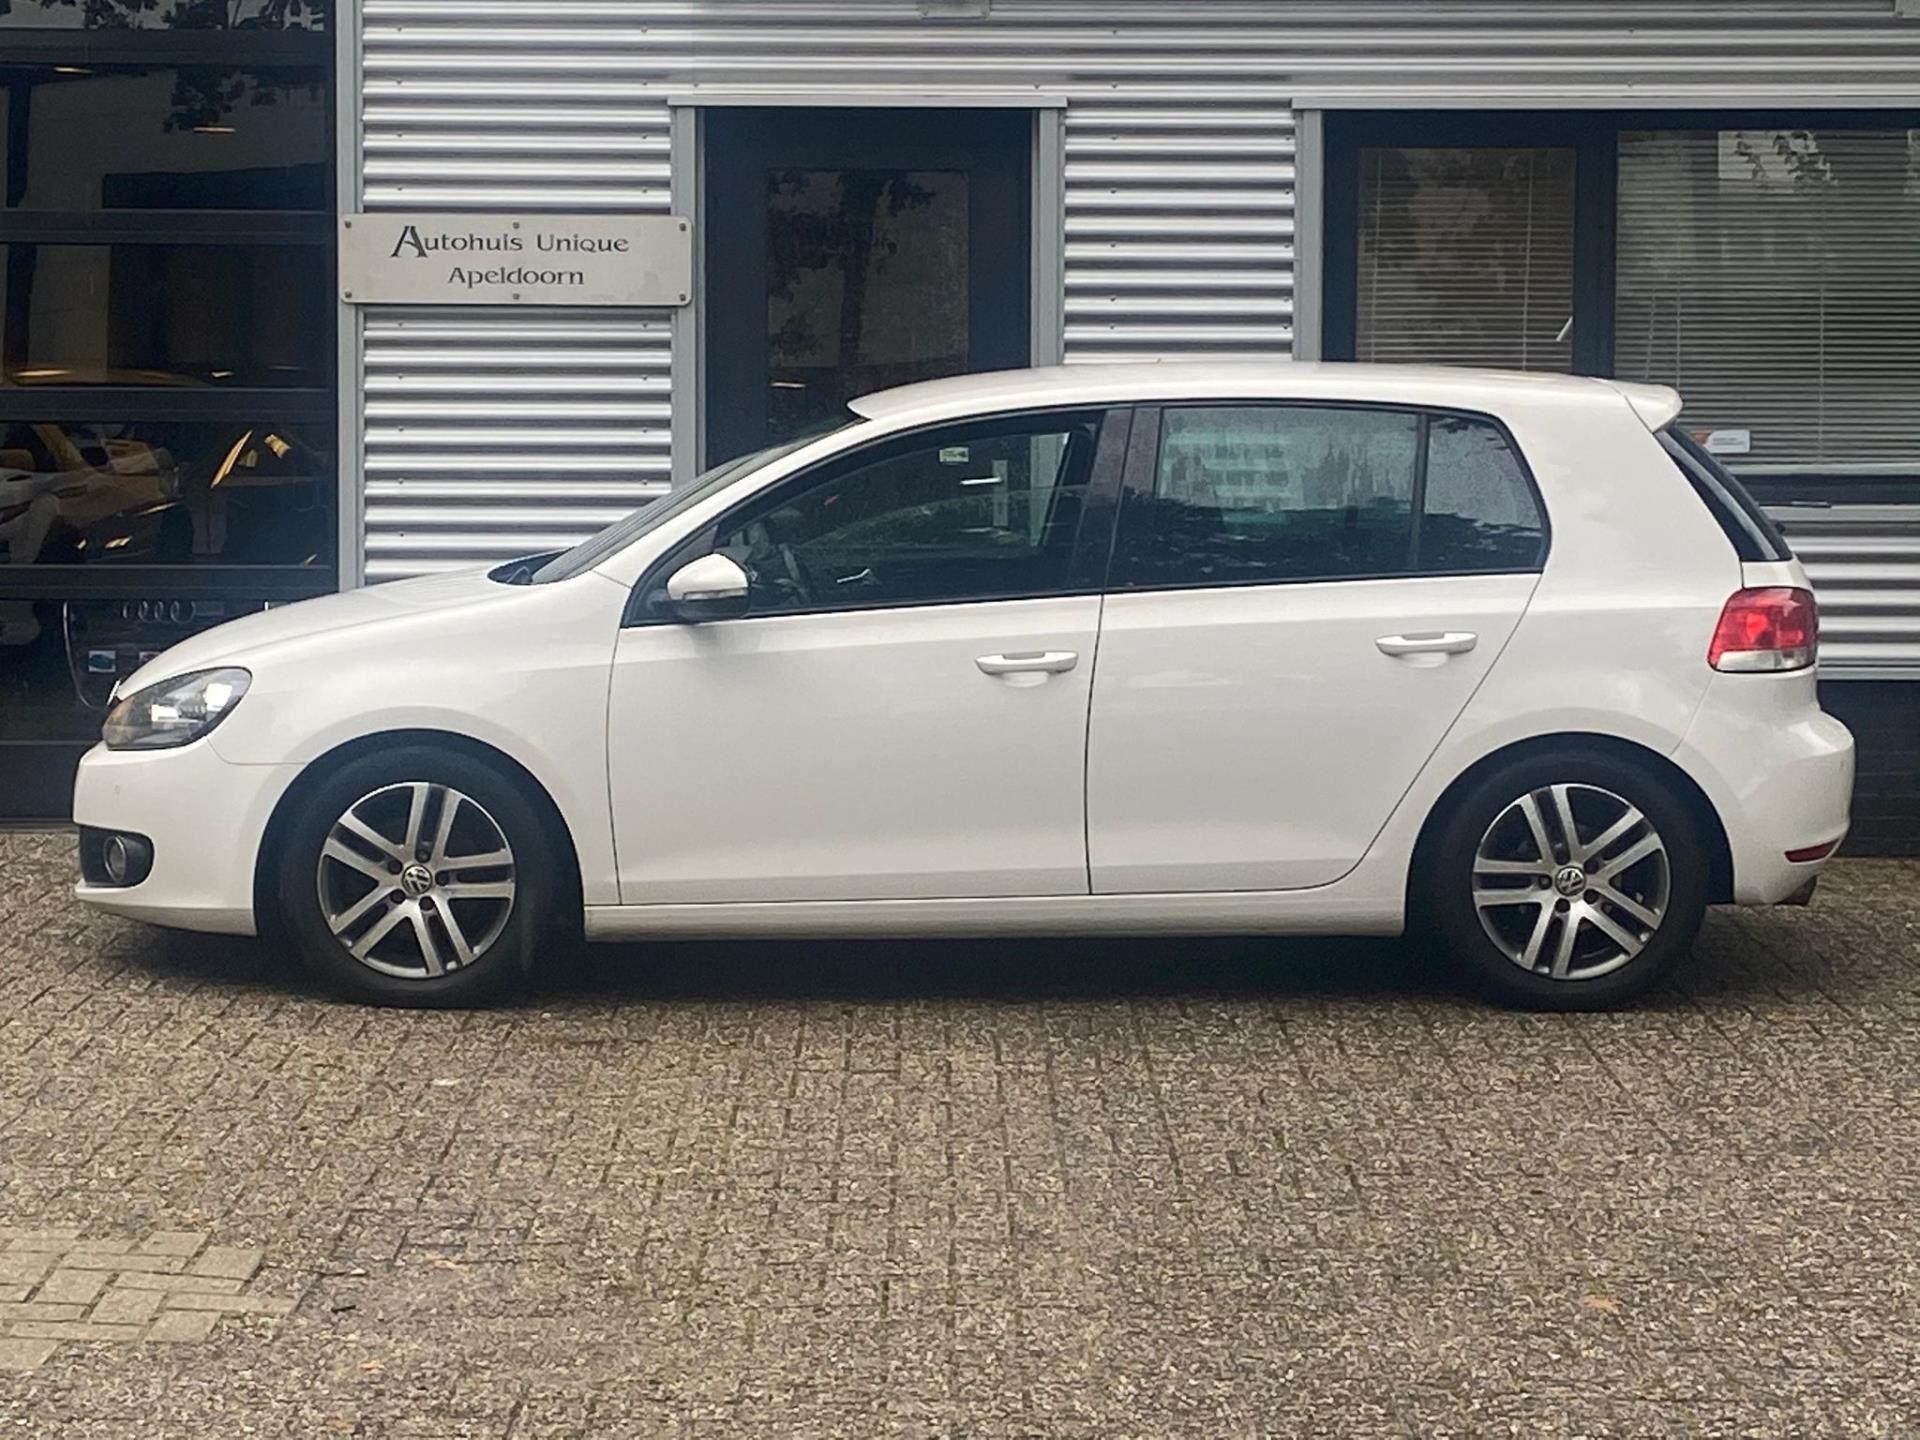 Volkswagen Golf occasion - Autohuis Unique